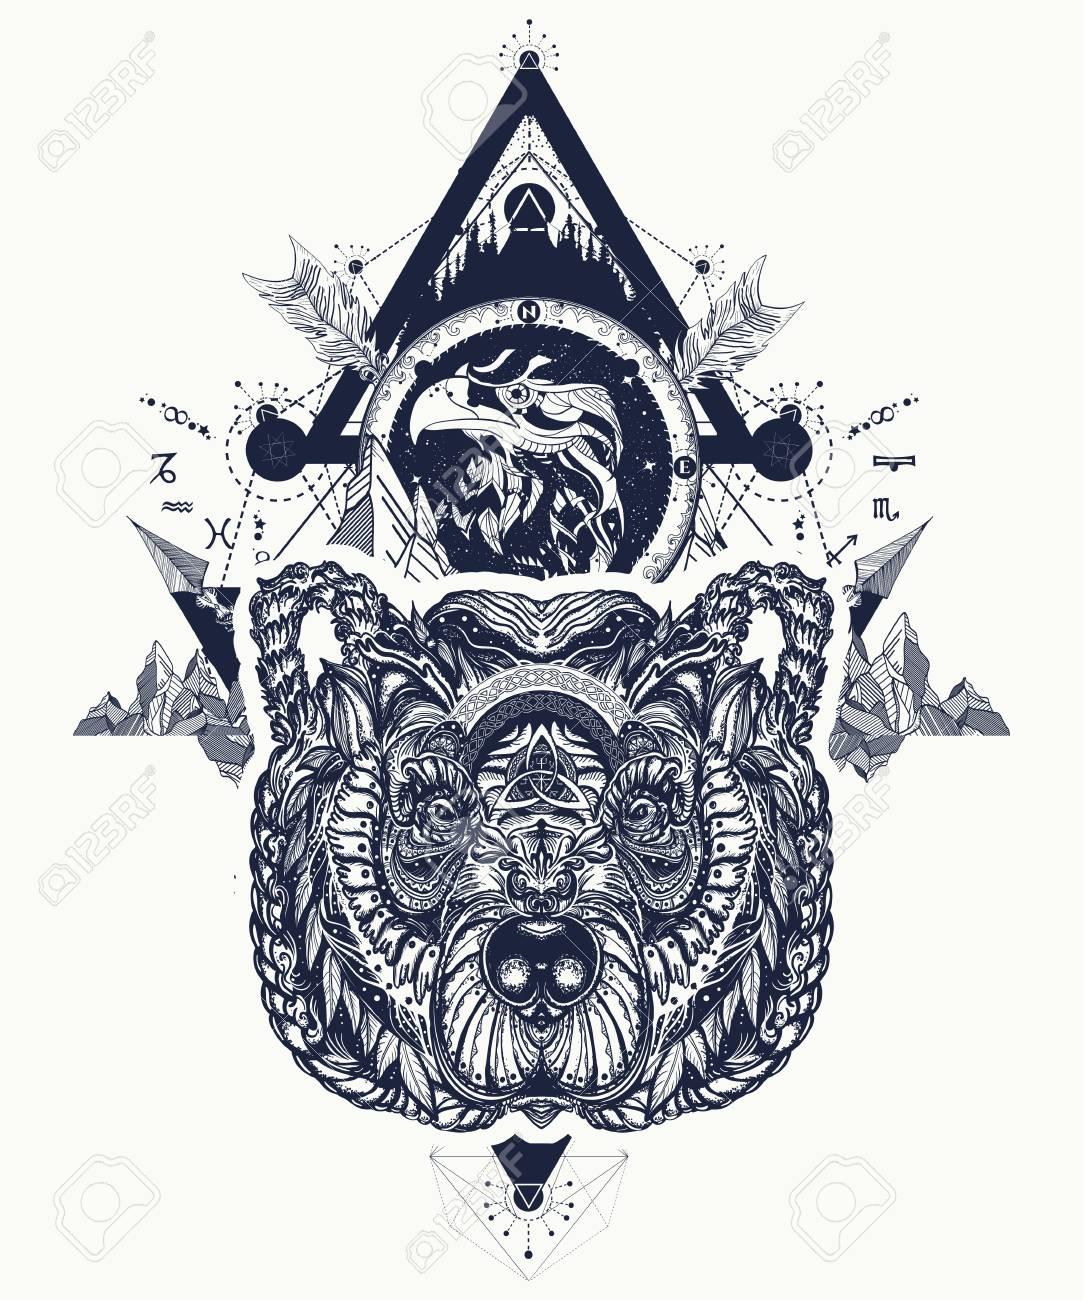 Eagle And Bear Tattoo Art Mountains Crossed Arrows Forest Spirituality Boho